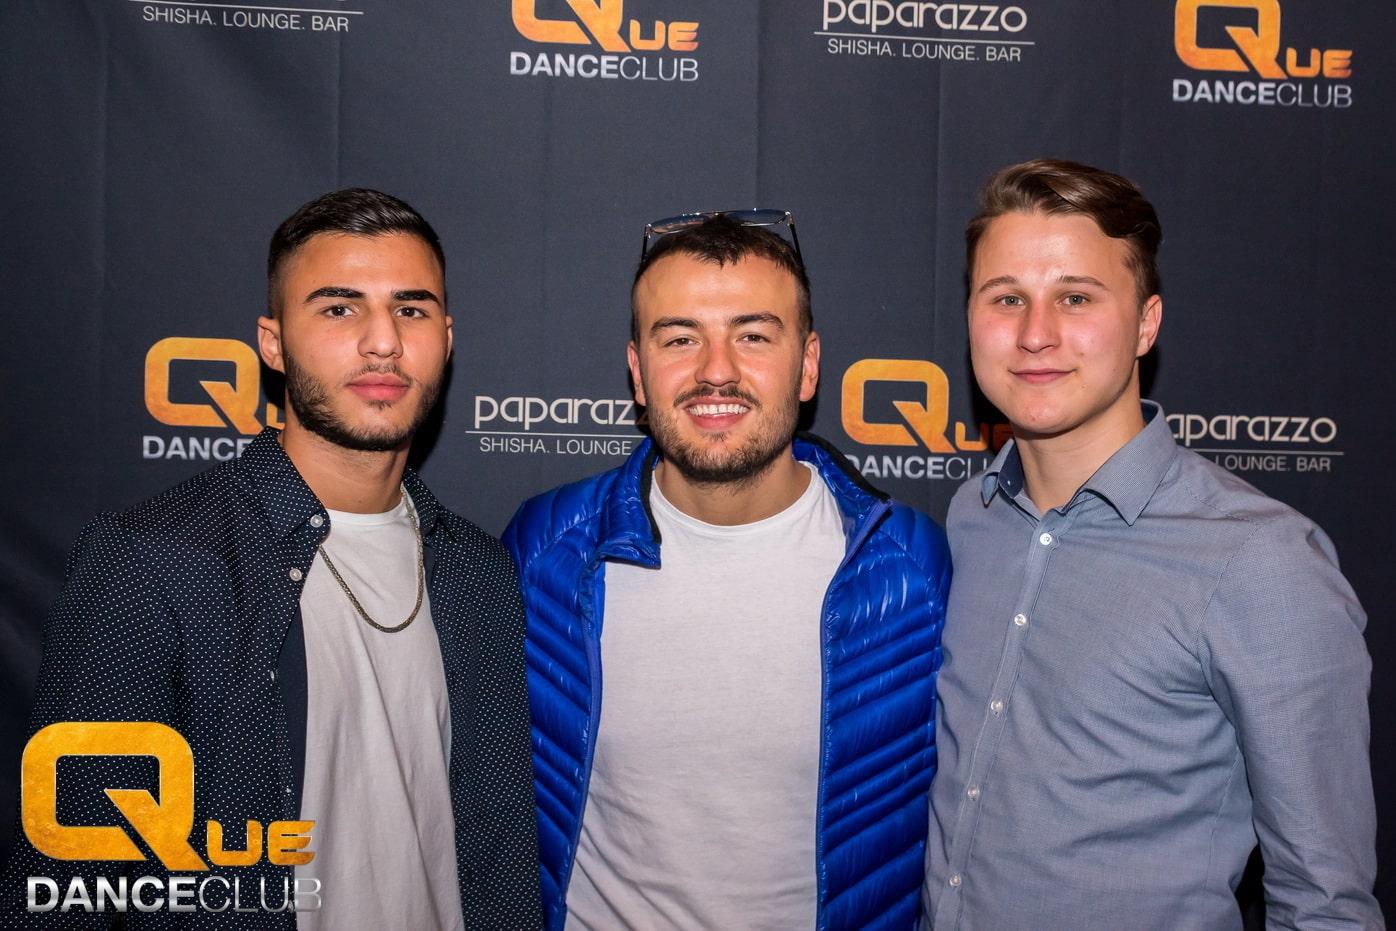 2018_12_08_Que_Danceclub_Paparazzo_Night_Ardian_Bujupi_Live_Nightlife_Scene_Timo_081